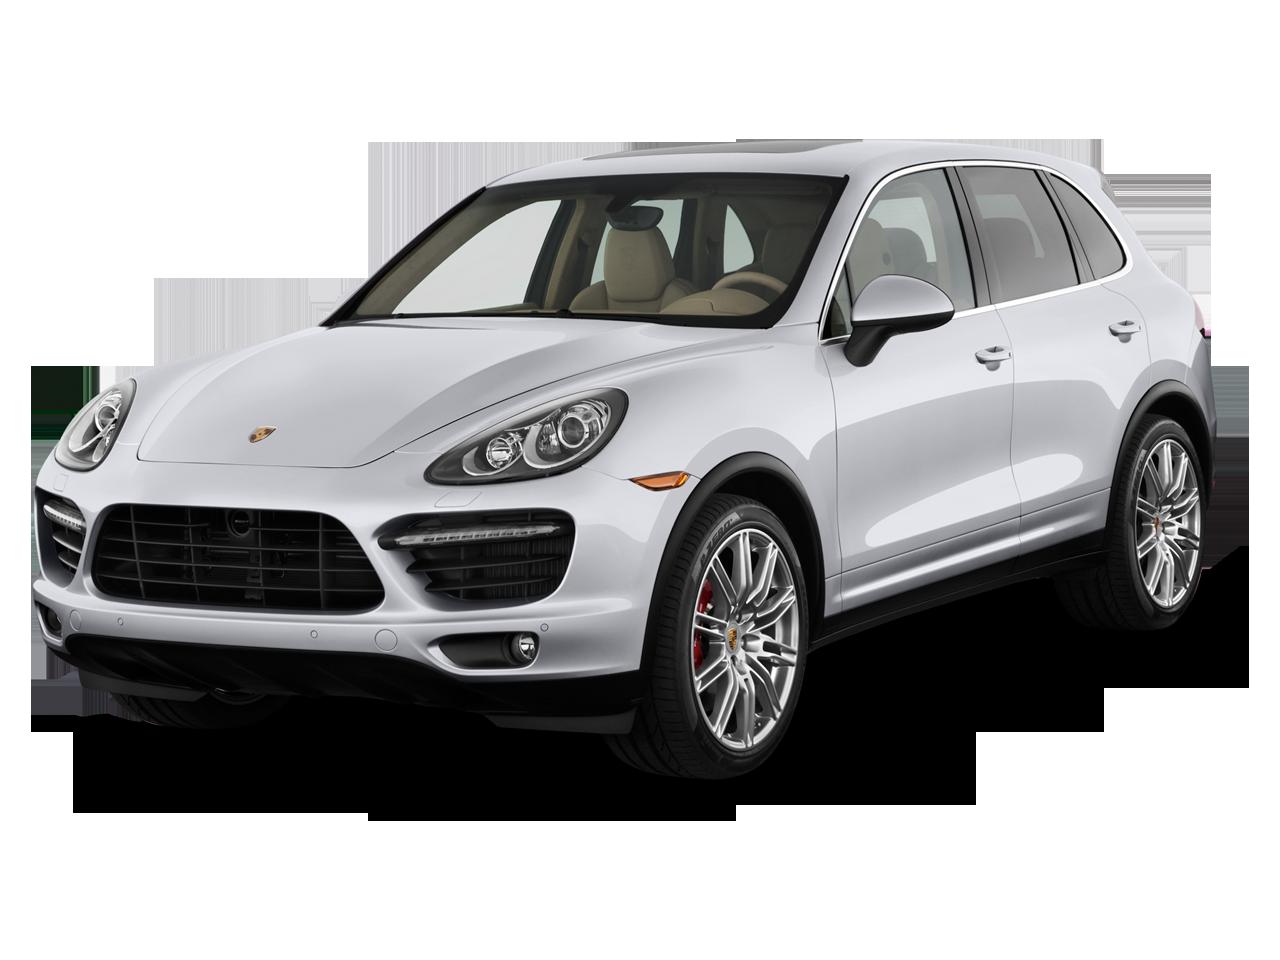 Porsche cayenne car PNG image